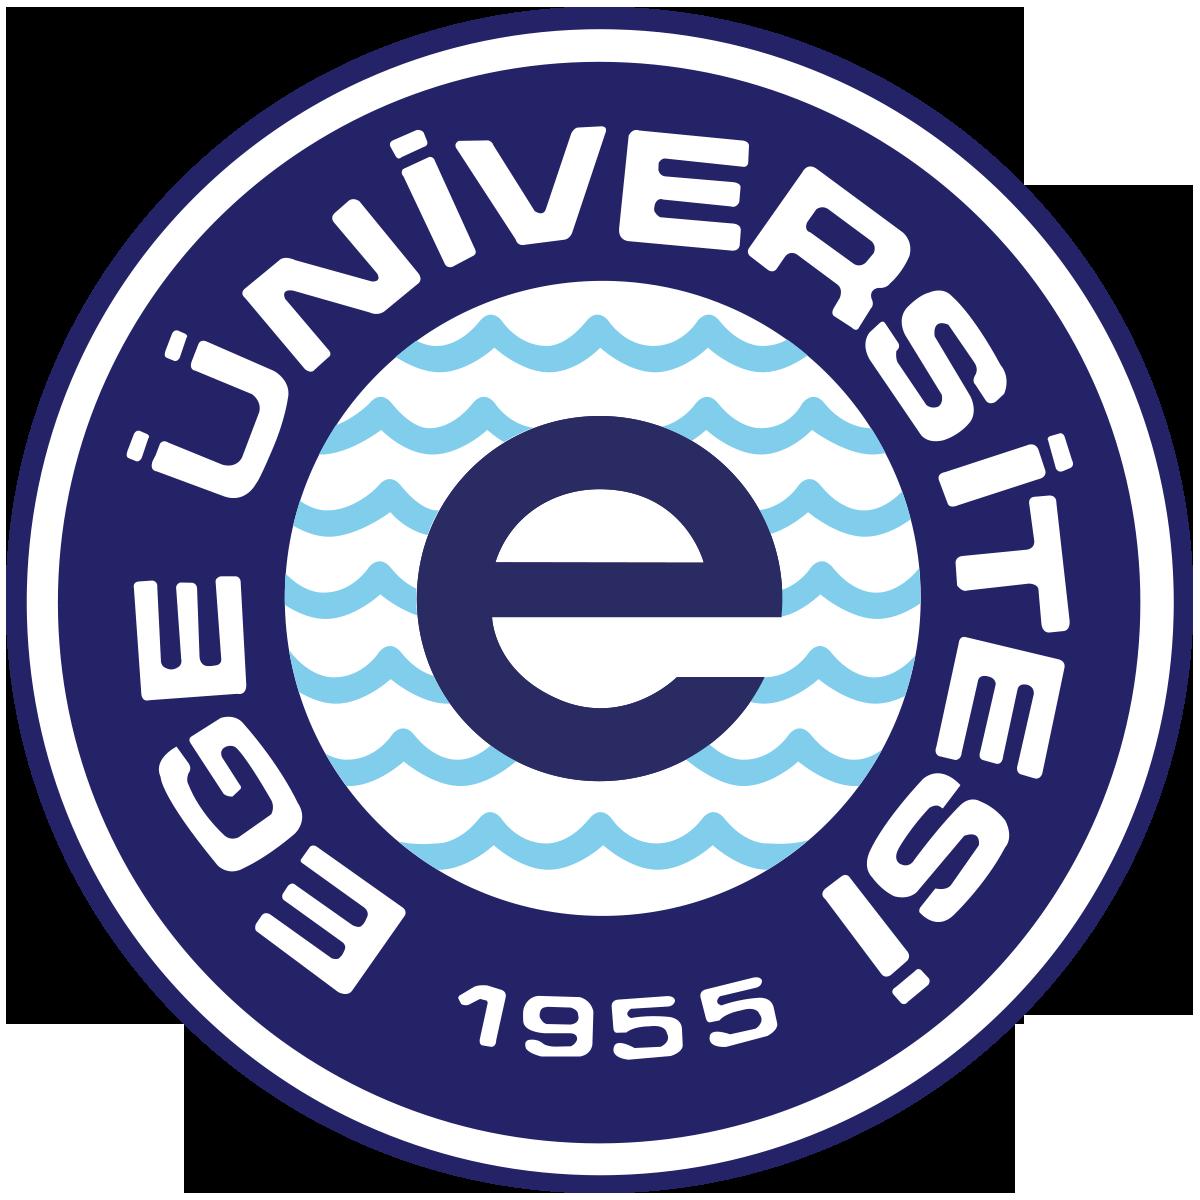 Ege University Wikipedia